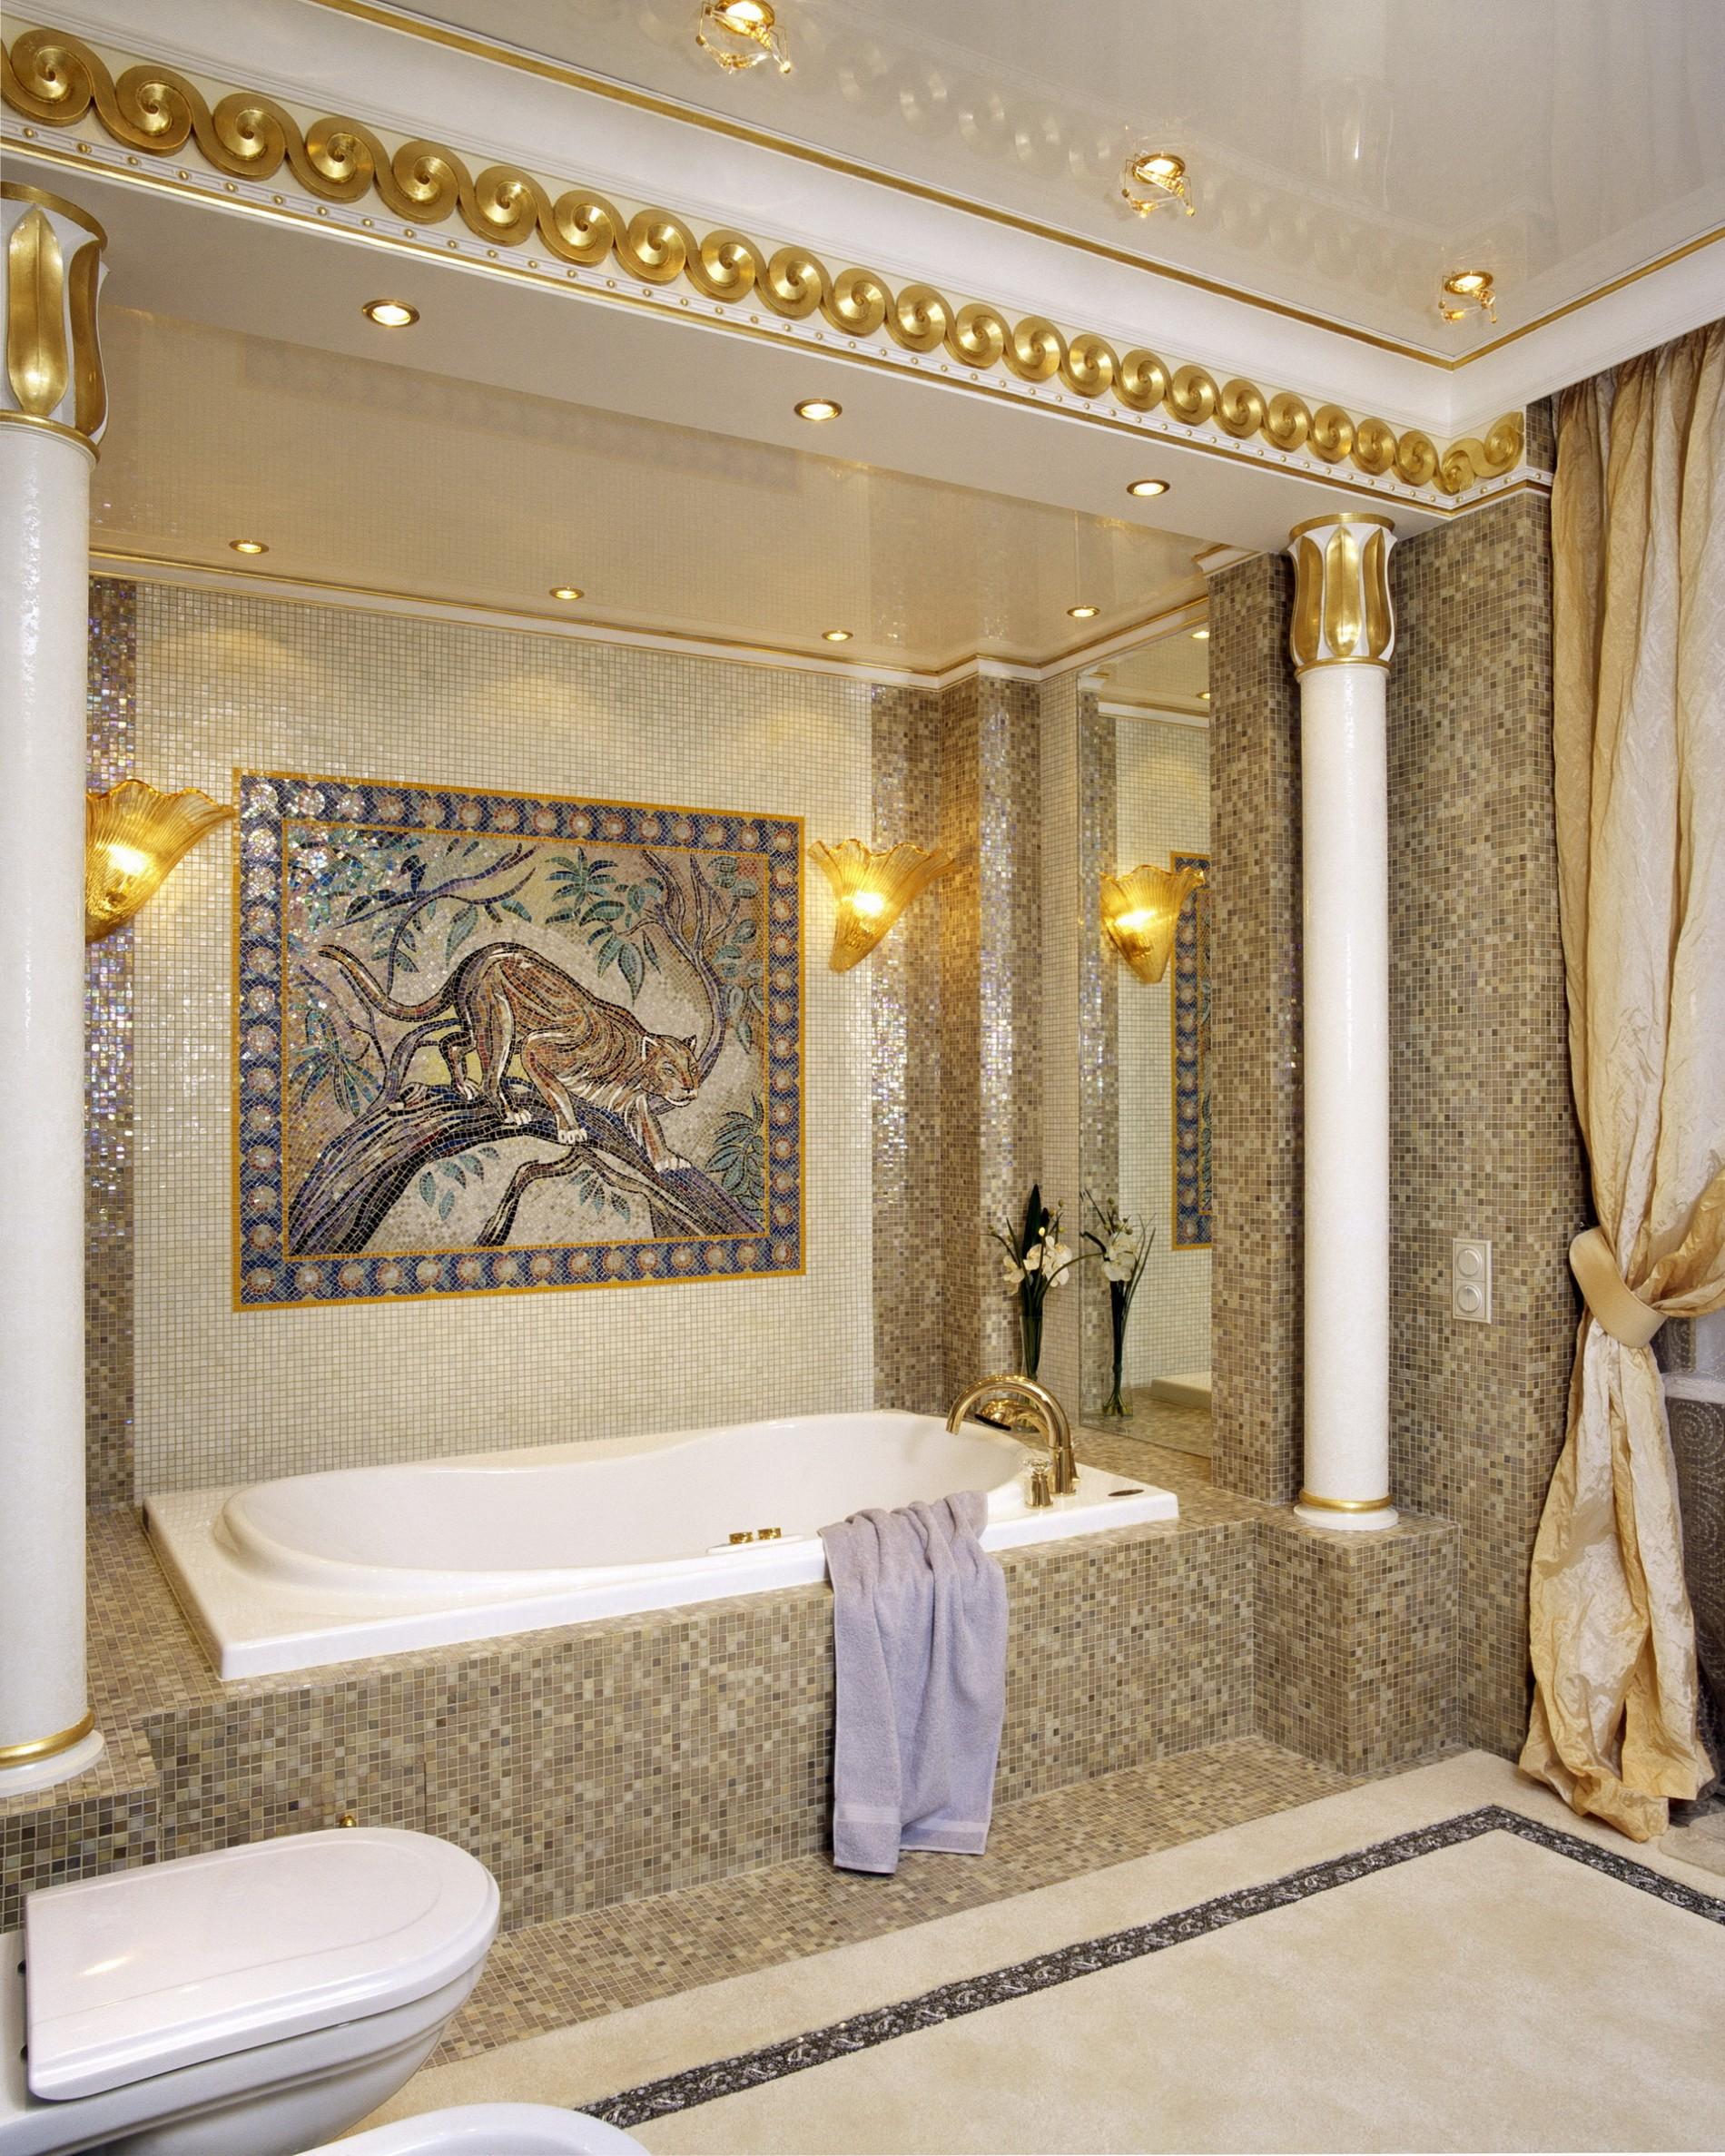 плитка мозаика в ванной ар деко